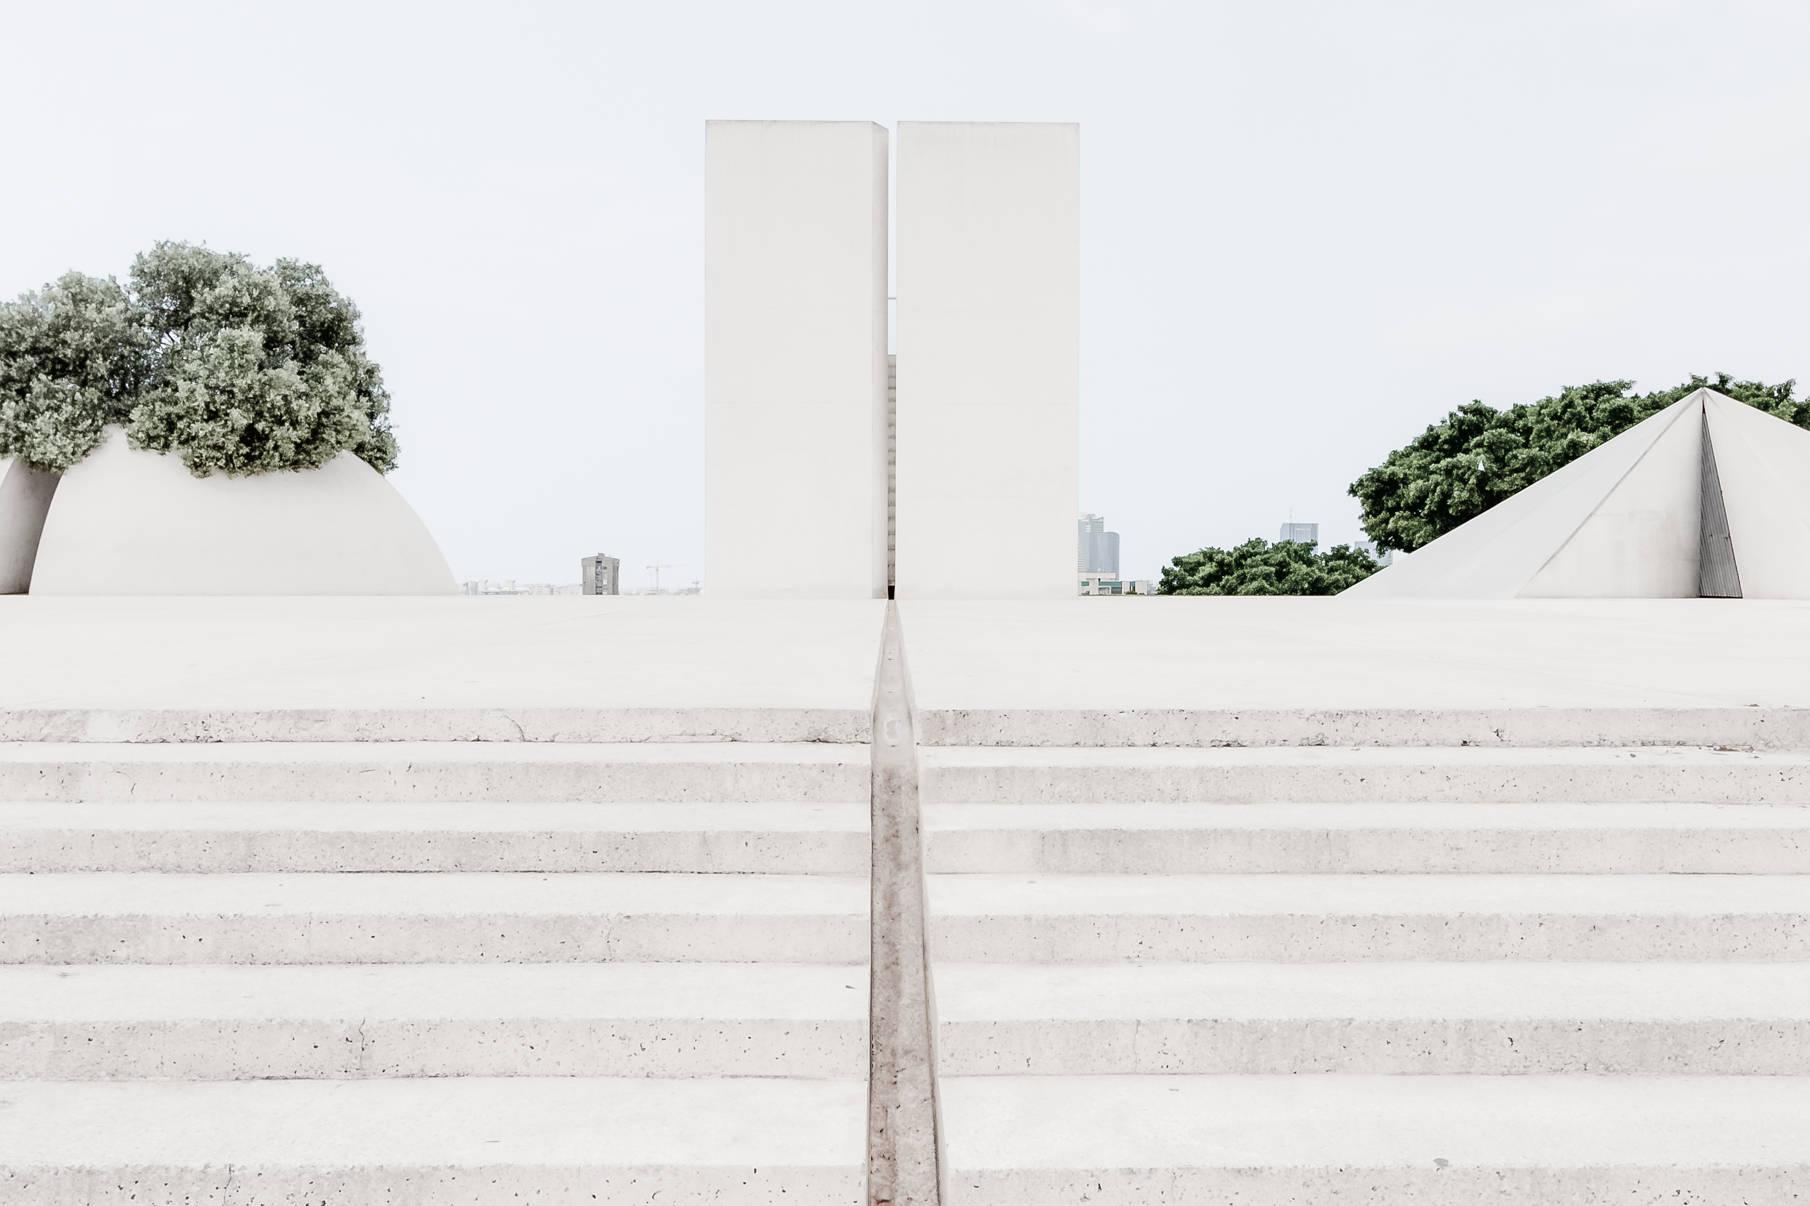 White Square by Danni Karavan / Richard Jochum